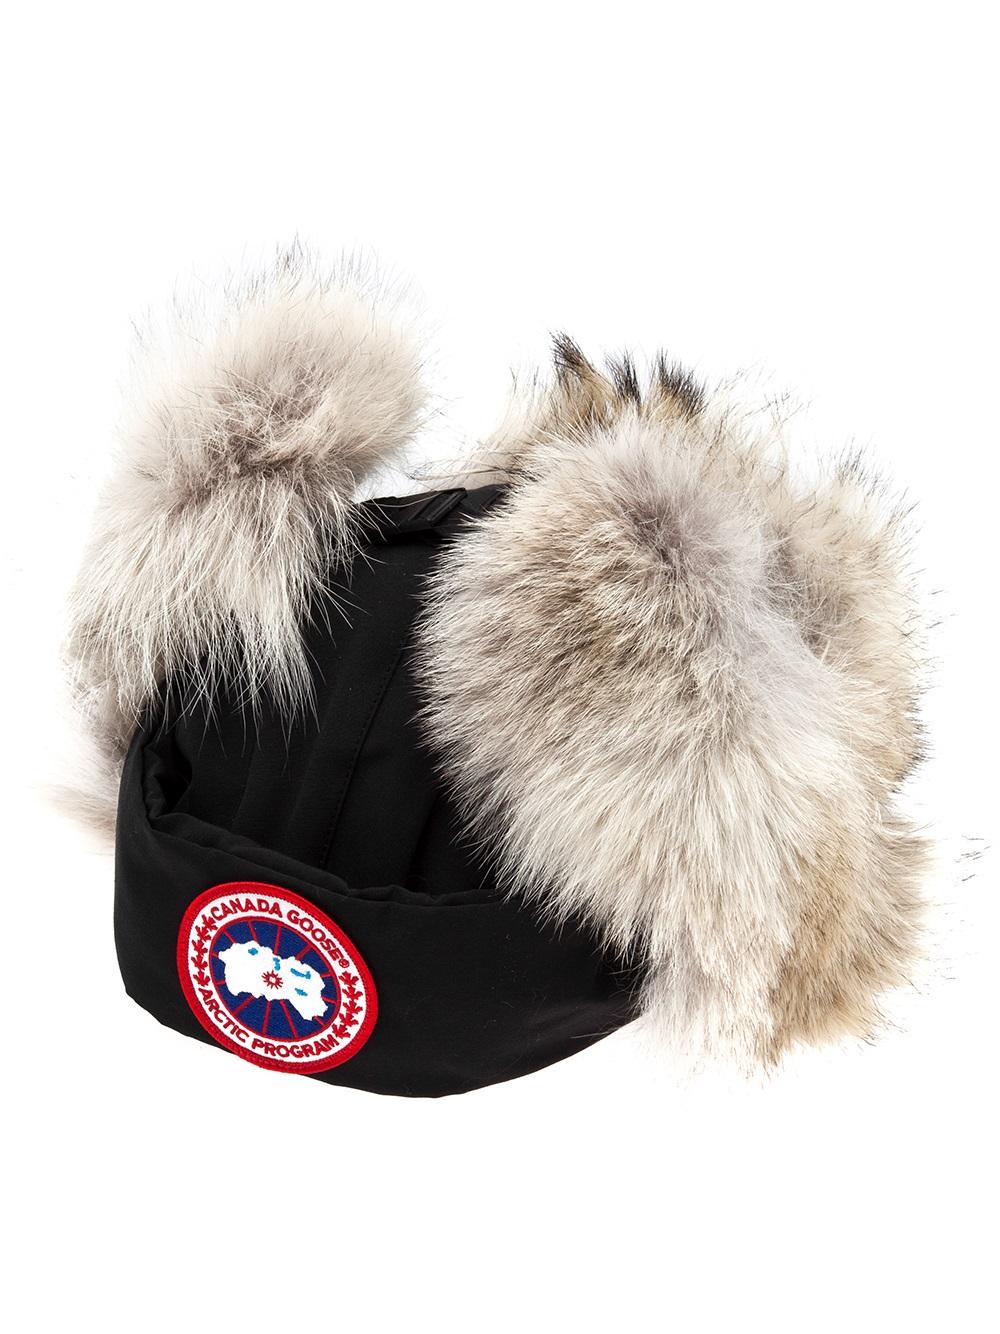 Canada Goose parka online 2016 - Canada goose Aviator Hat in Black for Men   Lyst